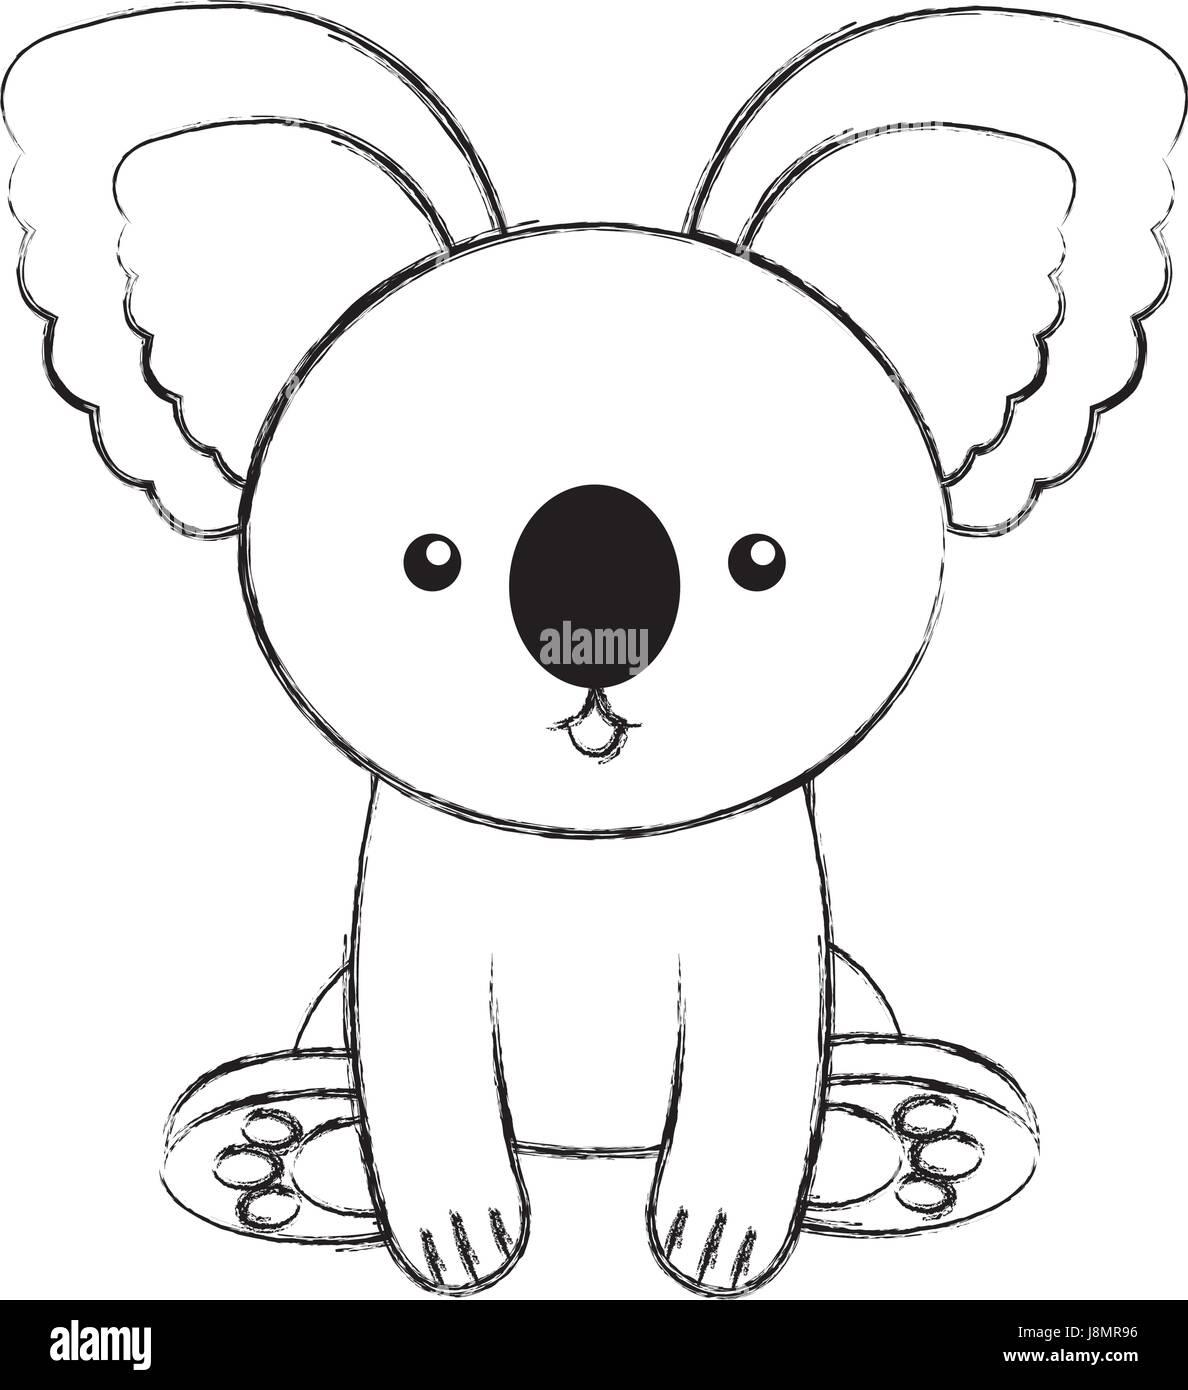 Cute Sketch Draw Koala Cartoon Stock Vector Art Illustration